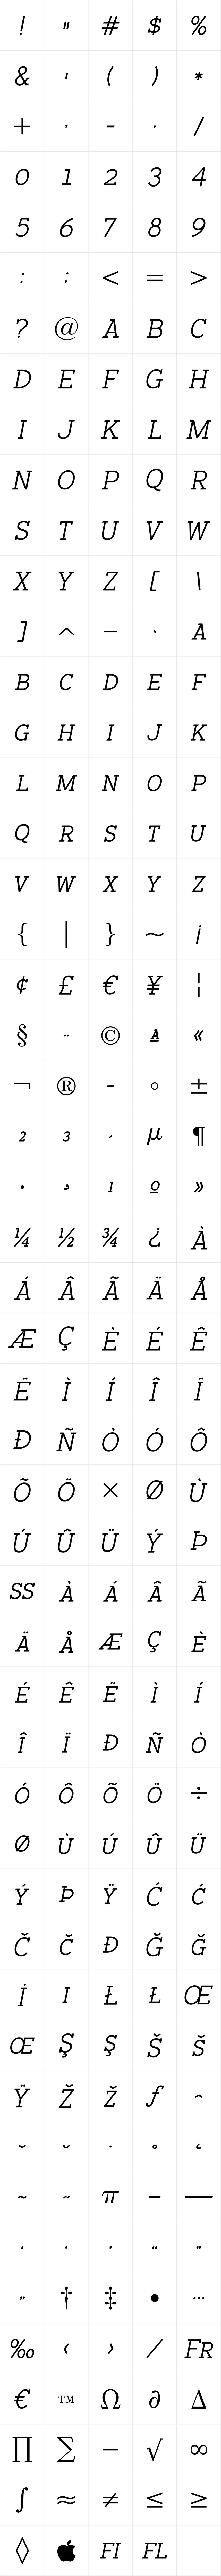 Backtalk Serif BTN SC Oblique